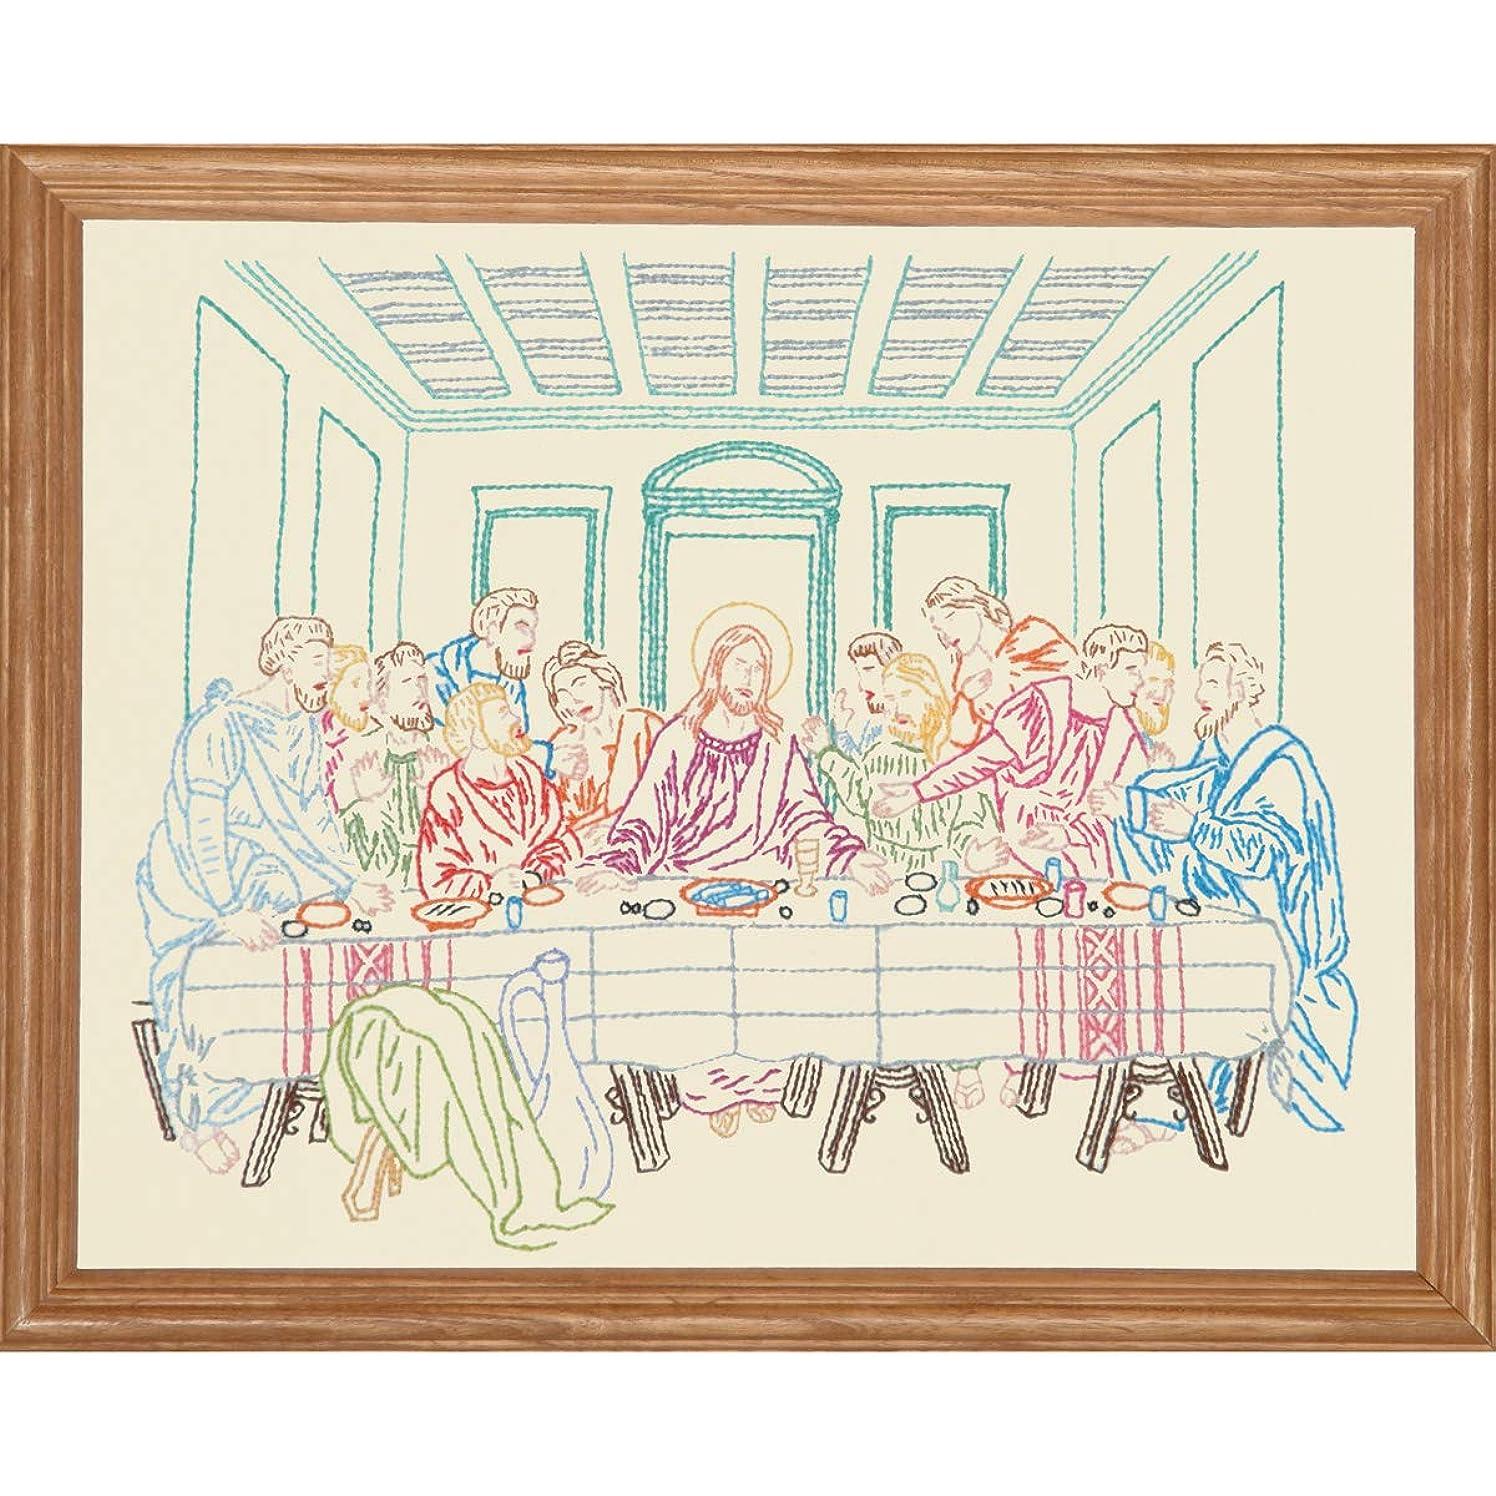 Jack Dempsey Stamped Sampler, 11 by 14-Inch, Last Supper, Antique